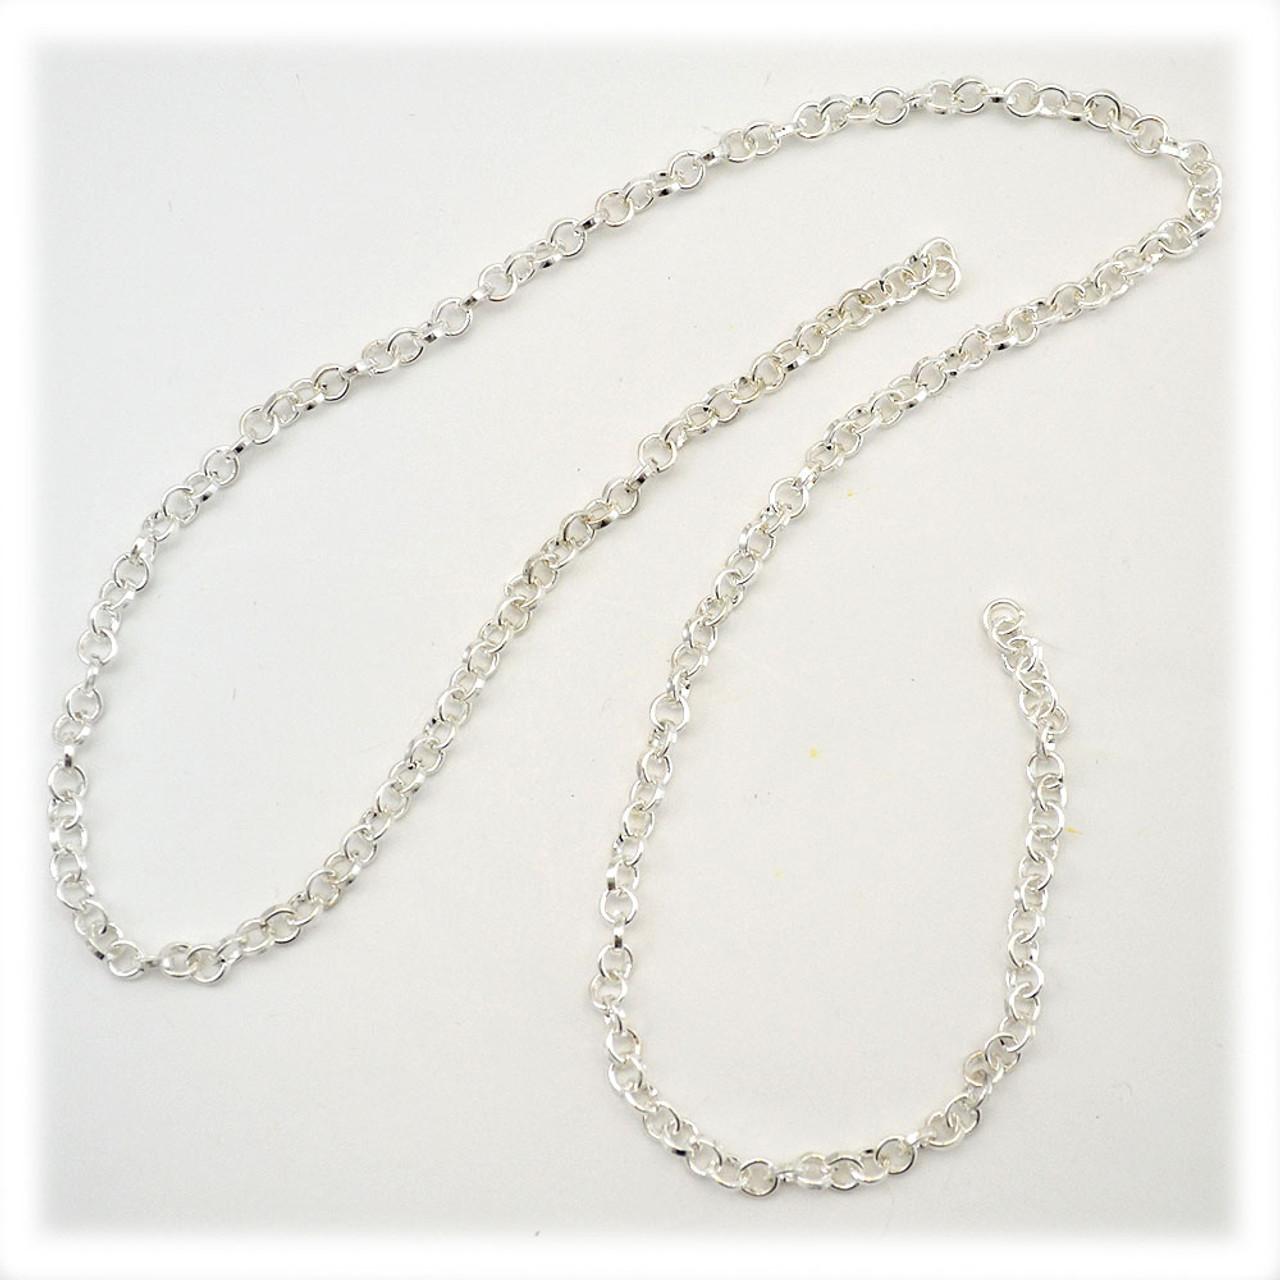 Silver Alternating Chain 18IN